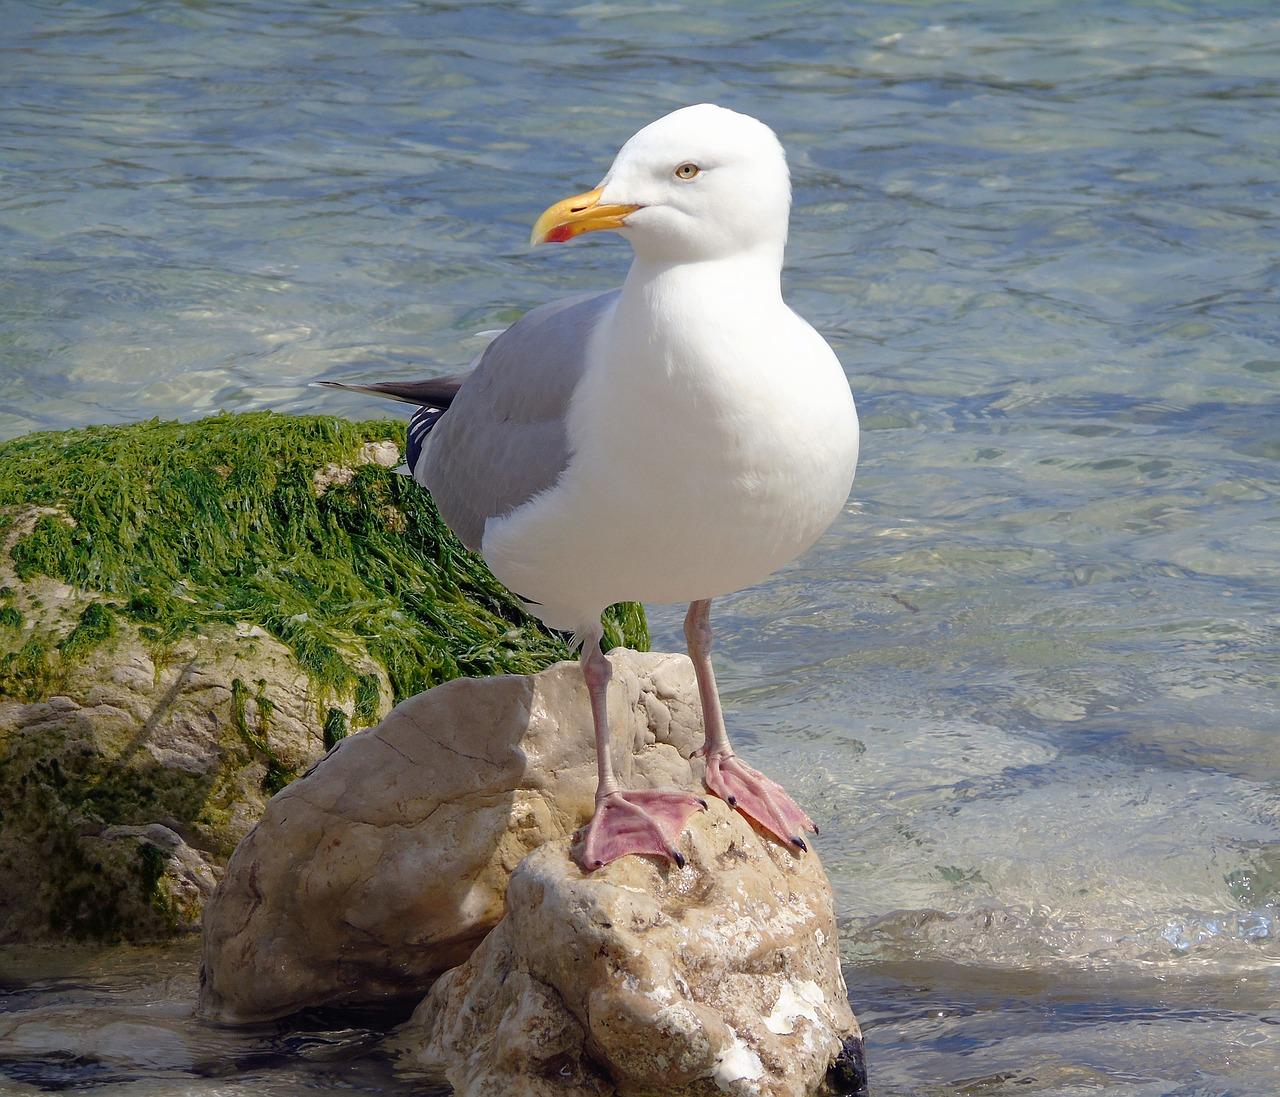 Seagull - Pixabay Public Domain